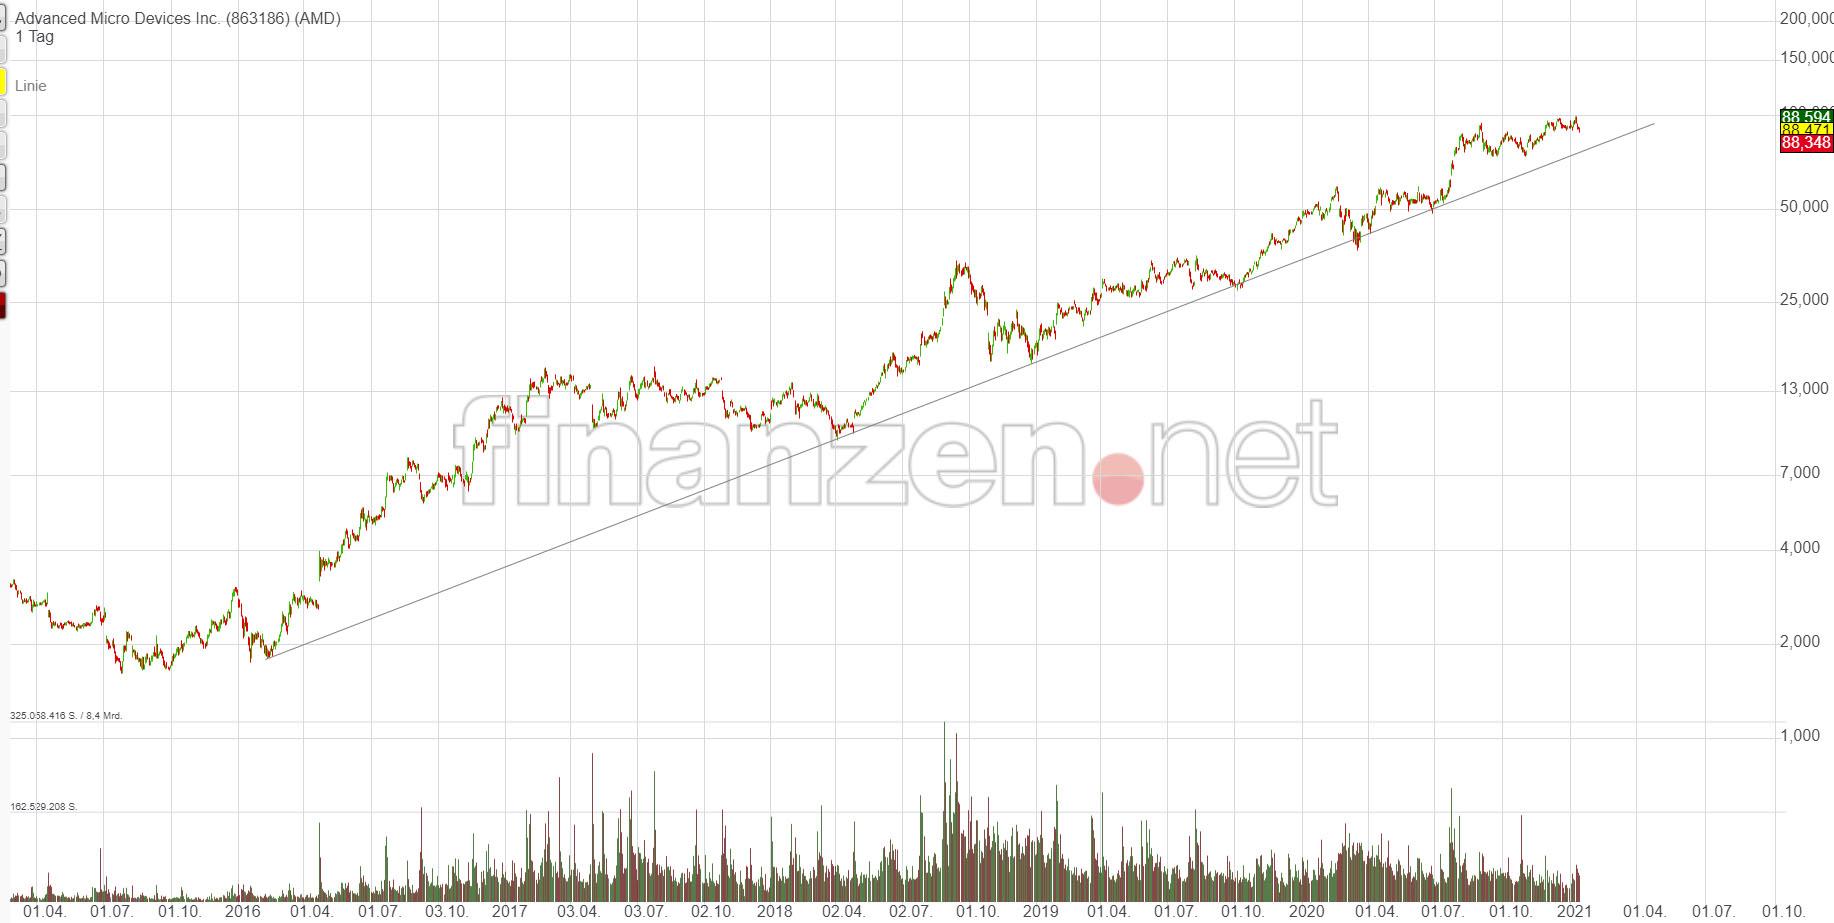 amd_chart_2021_01.jpg